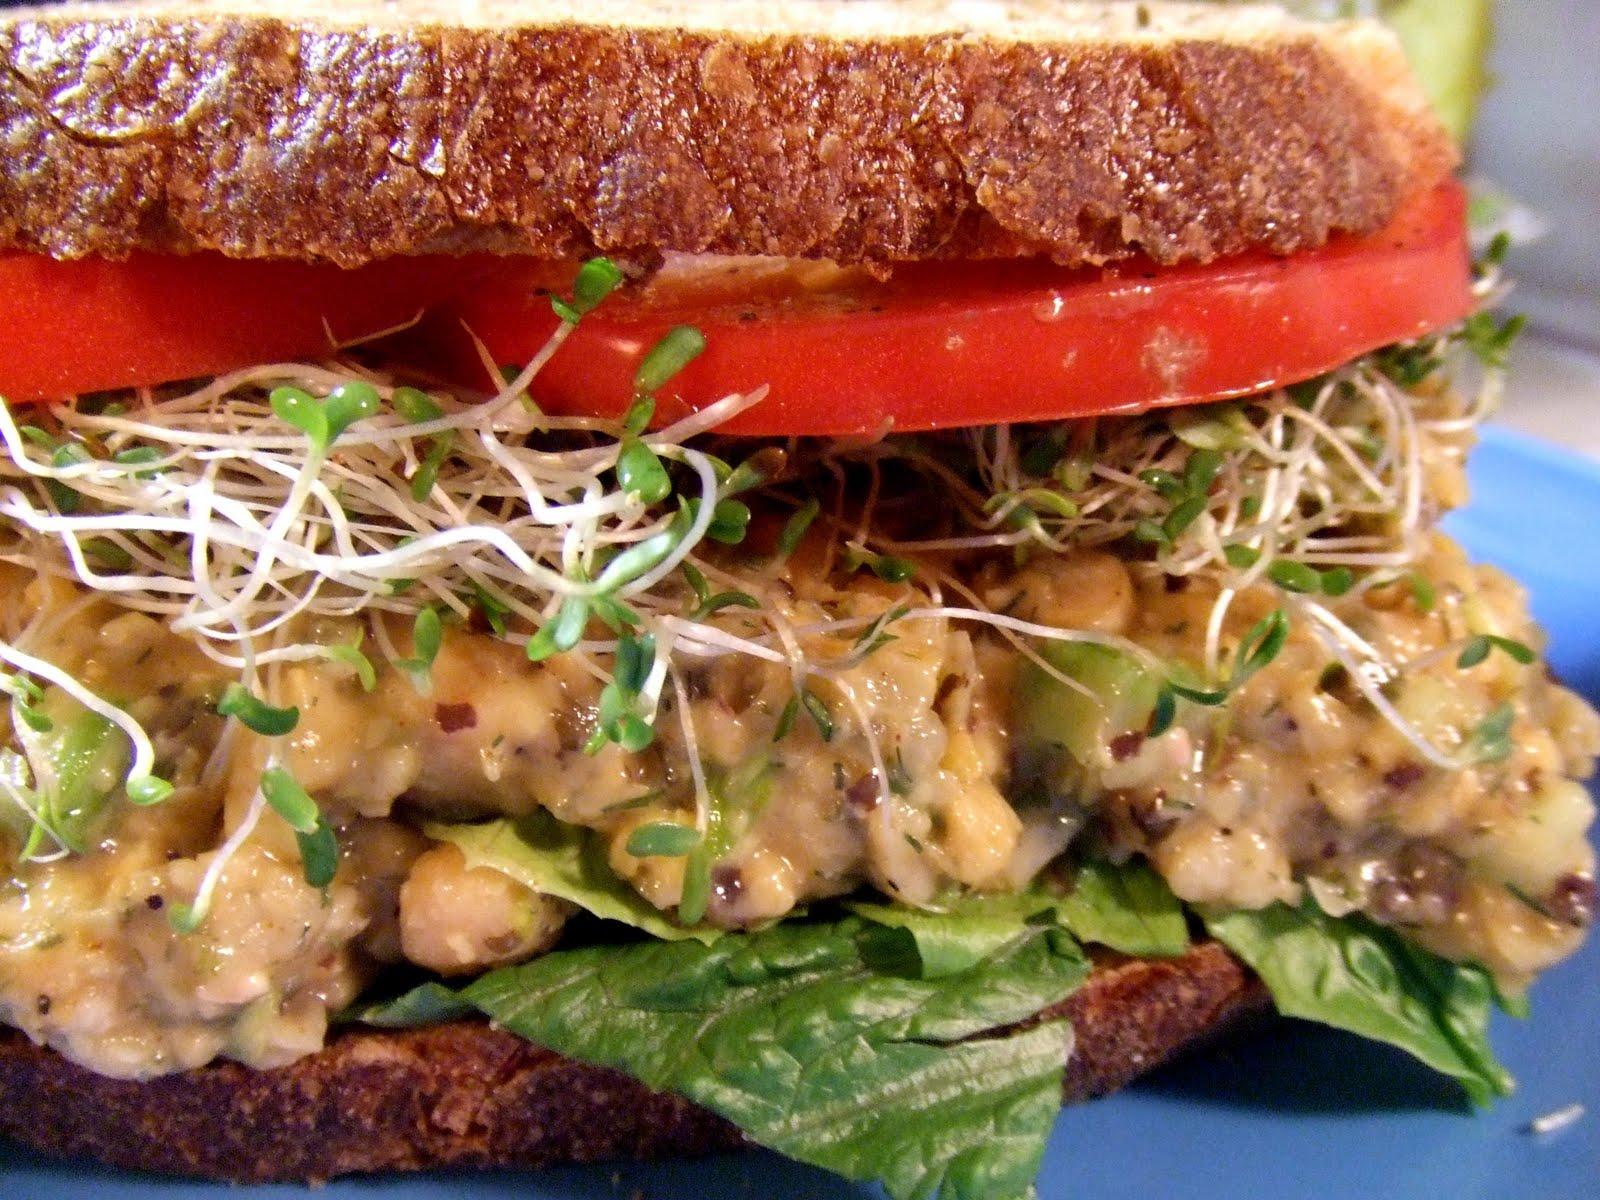 Chickpea 'Tuna' Salad Sandwich [Vegan]